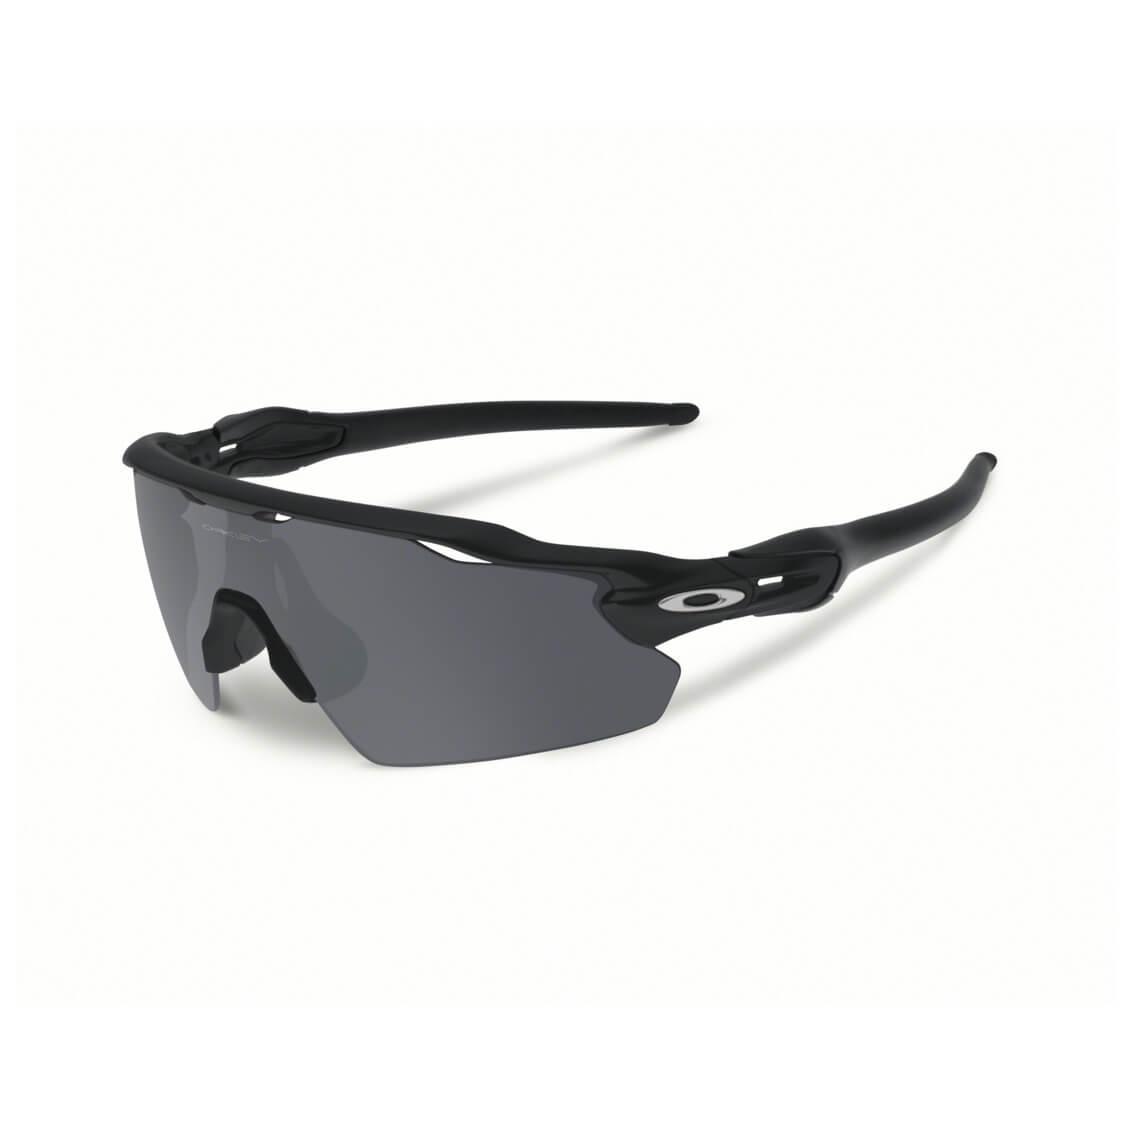 Oakley Radar Ev Pitch Cycling Glasses Buy Online